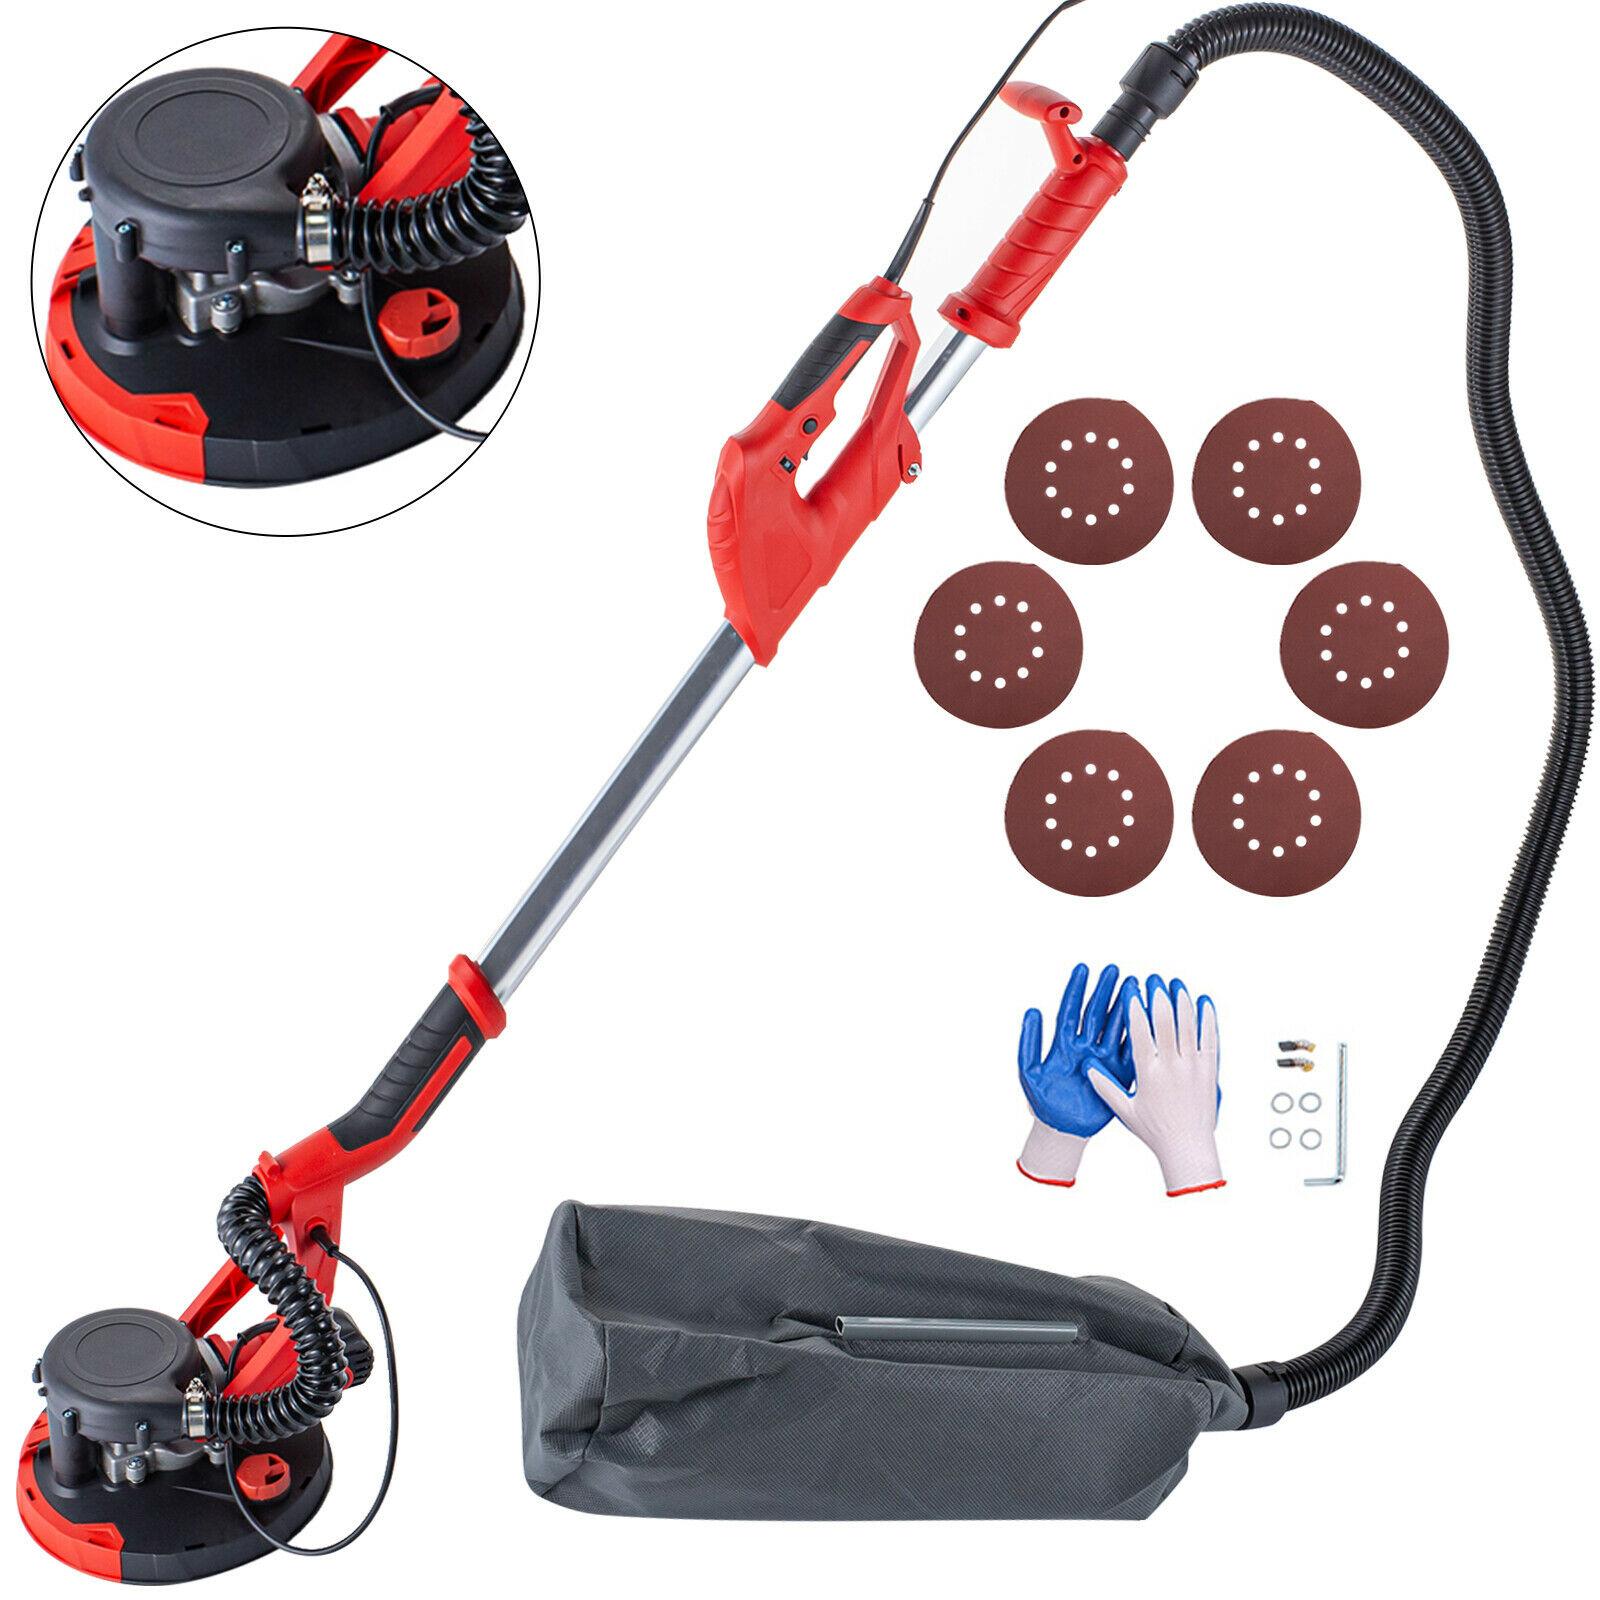 Electric Drywall Sander Extendable Sander with Vacuum Bag 750W Wall Disc Sander